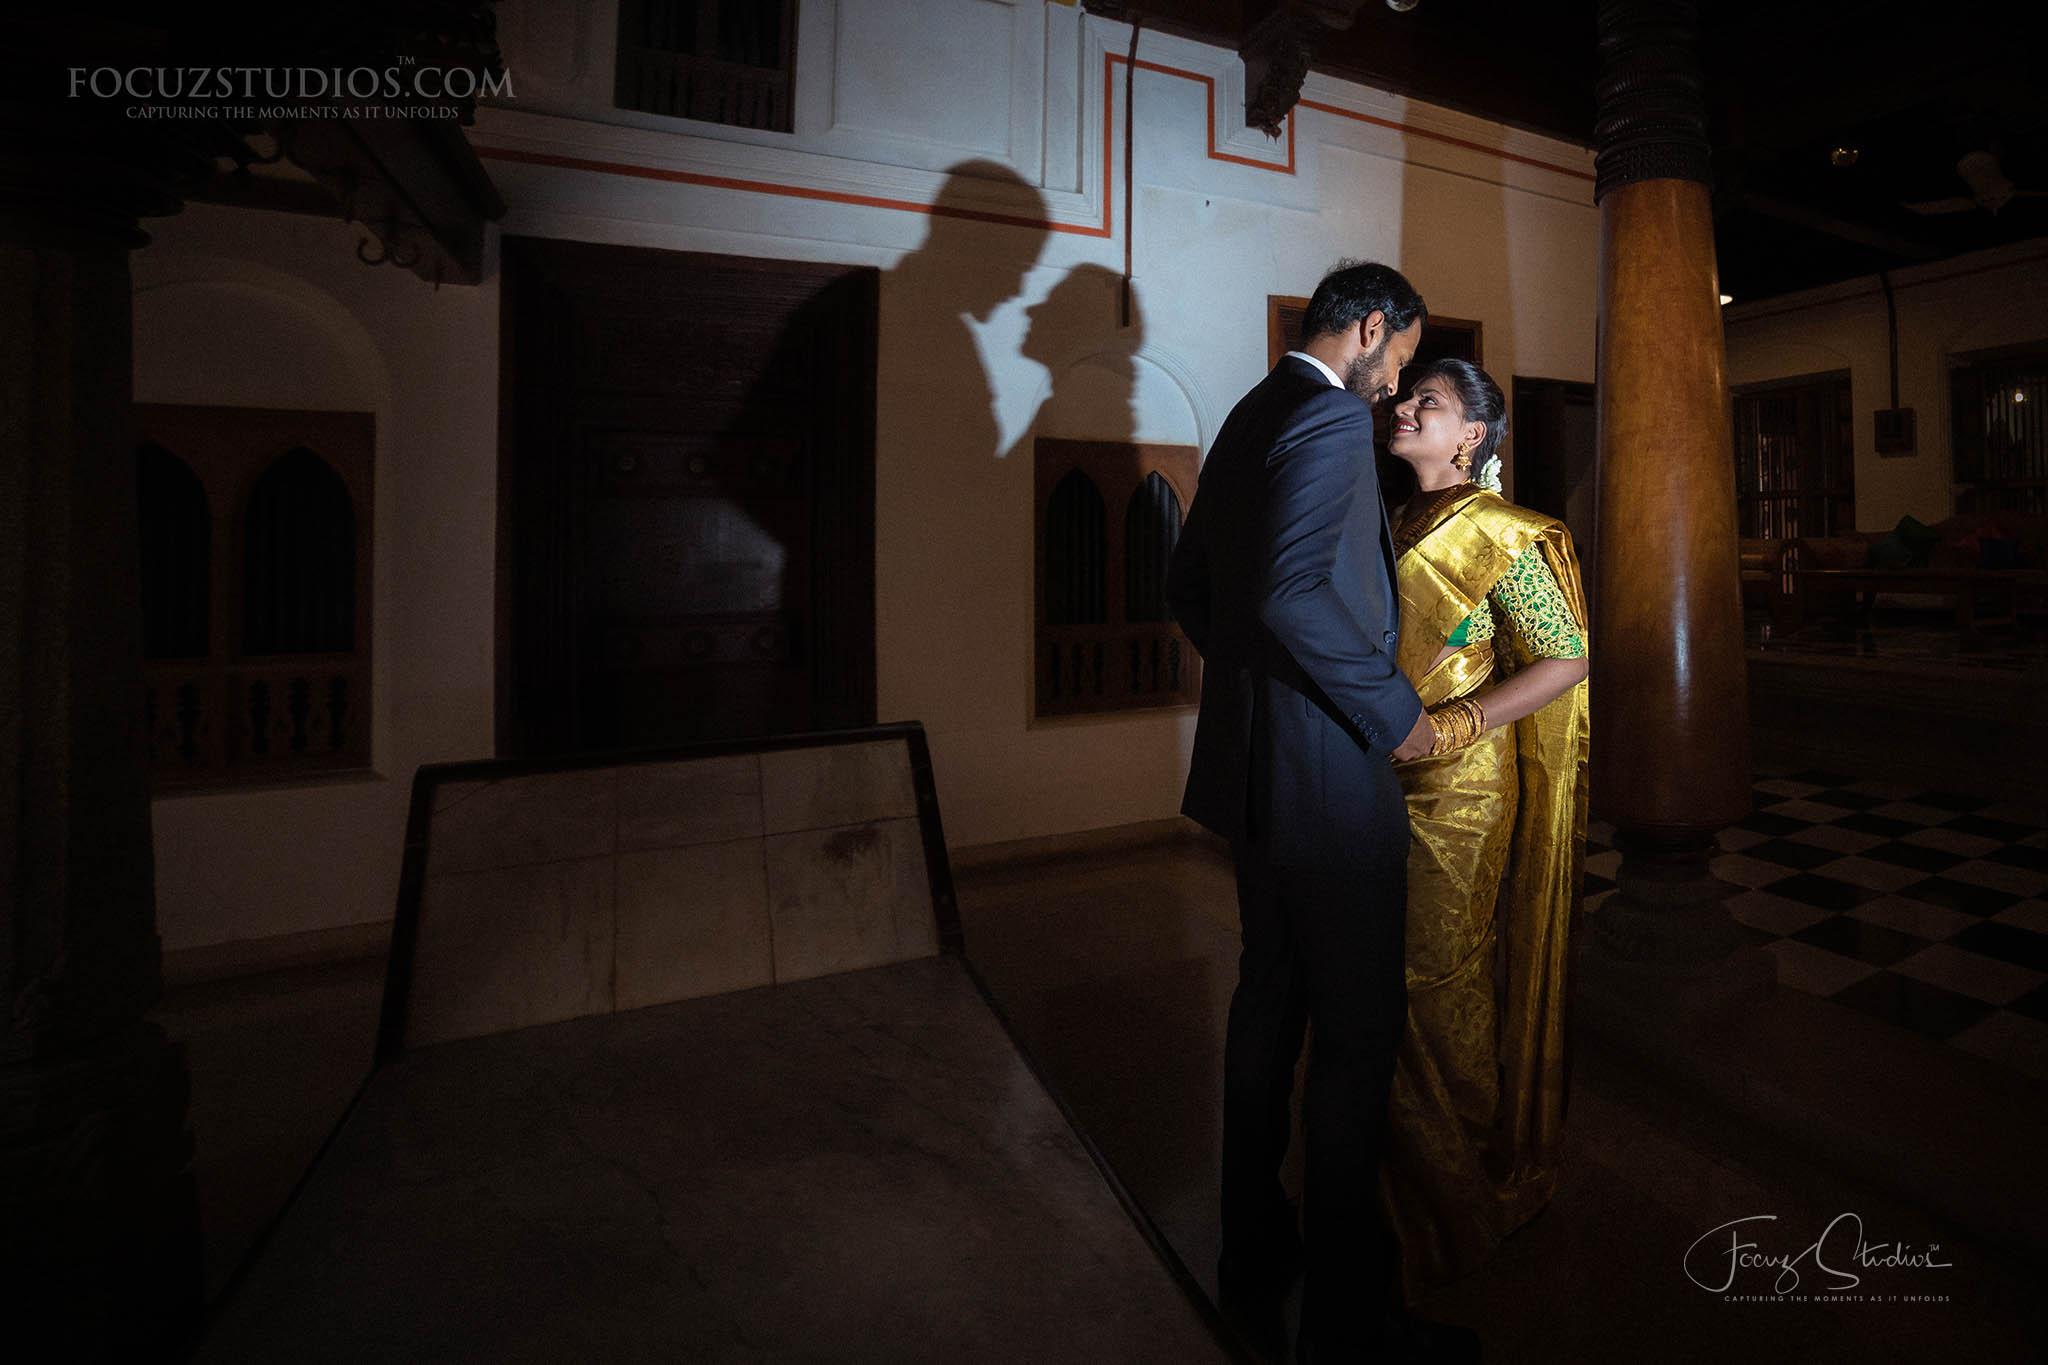 Focuz Studios pre wedding photo shoot